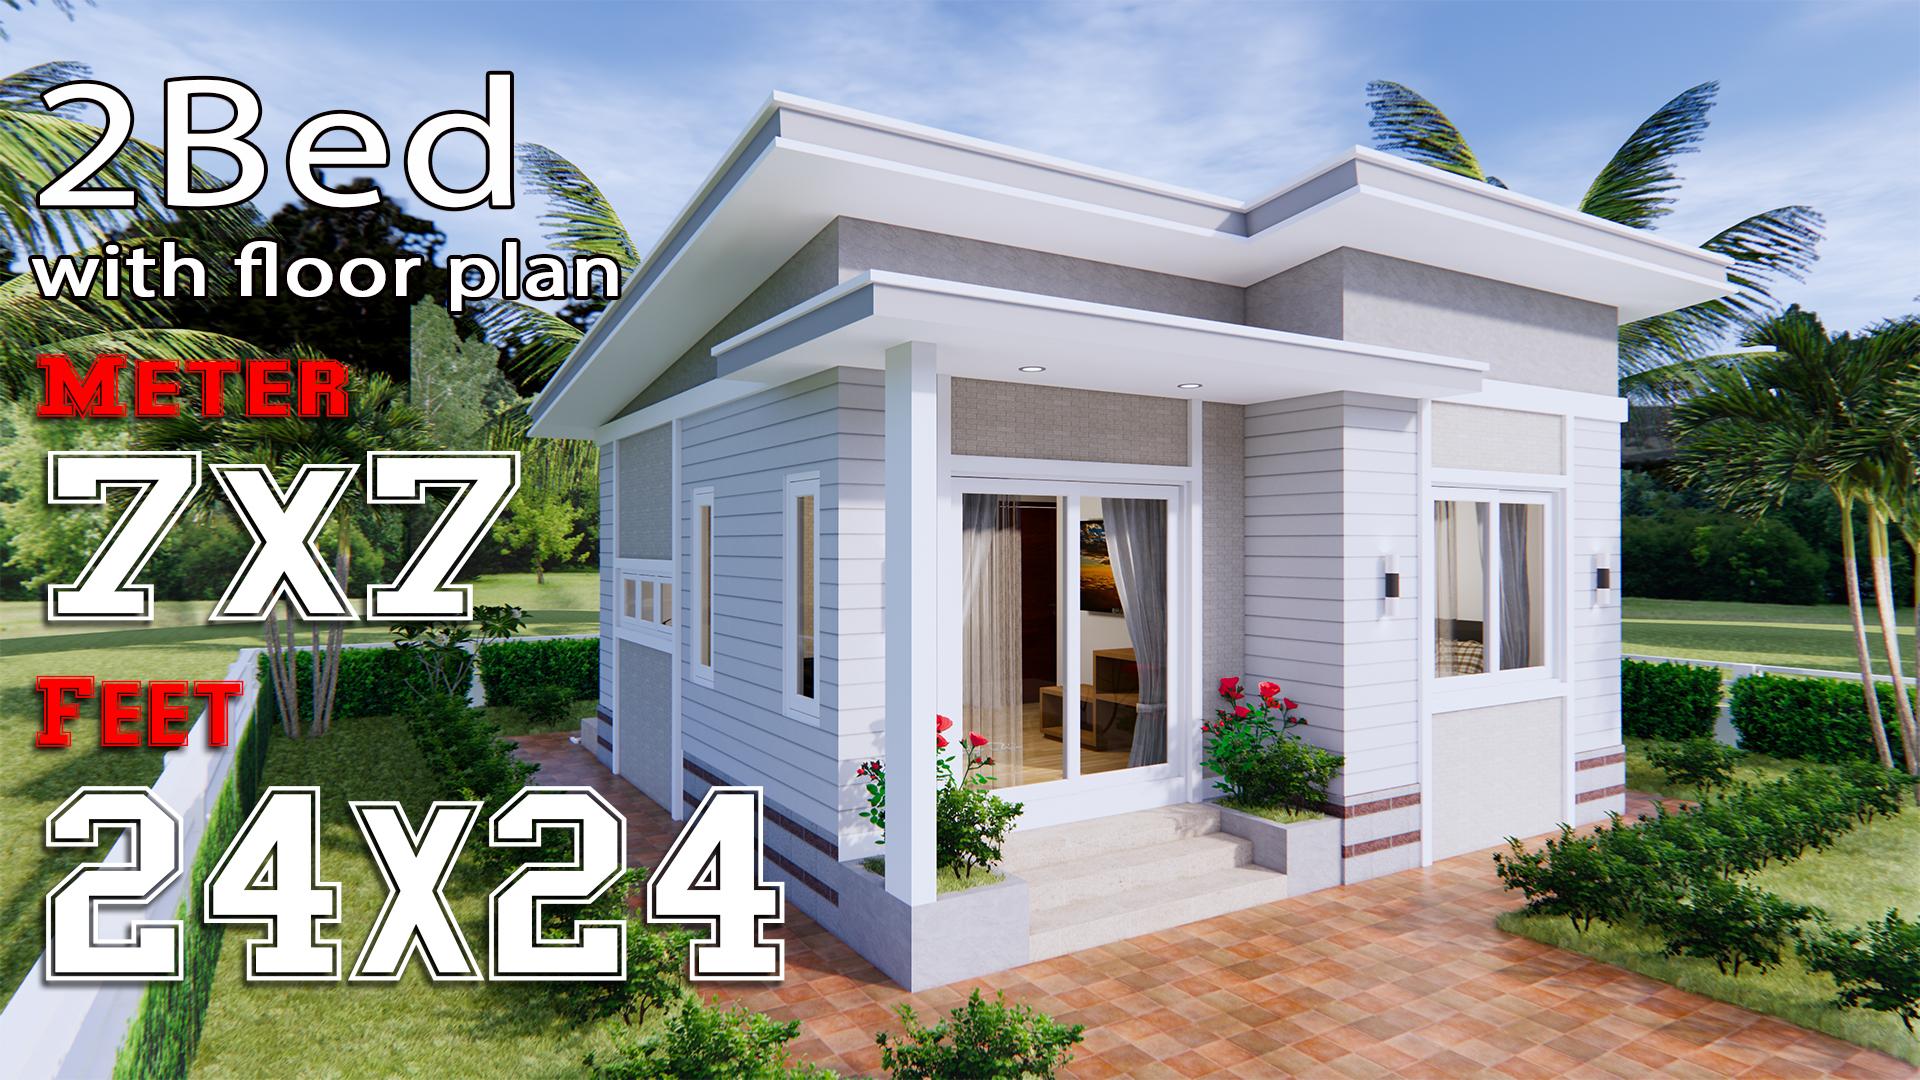 Small house design 7x7 Meters 24x24 Feet - SamHousePlans